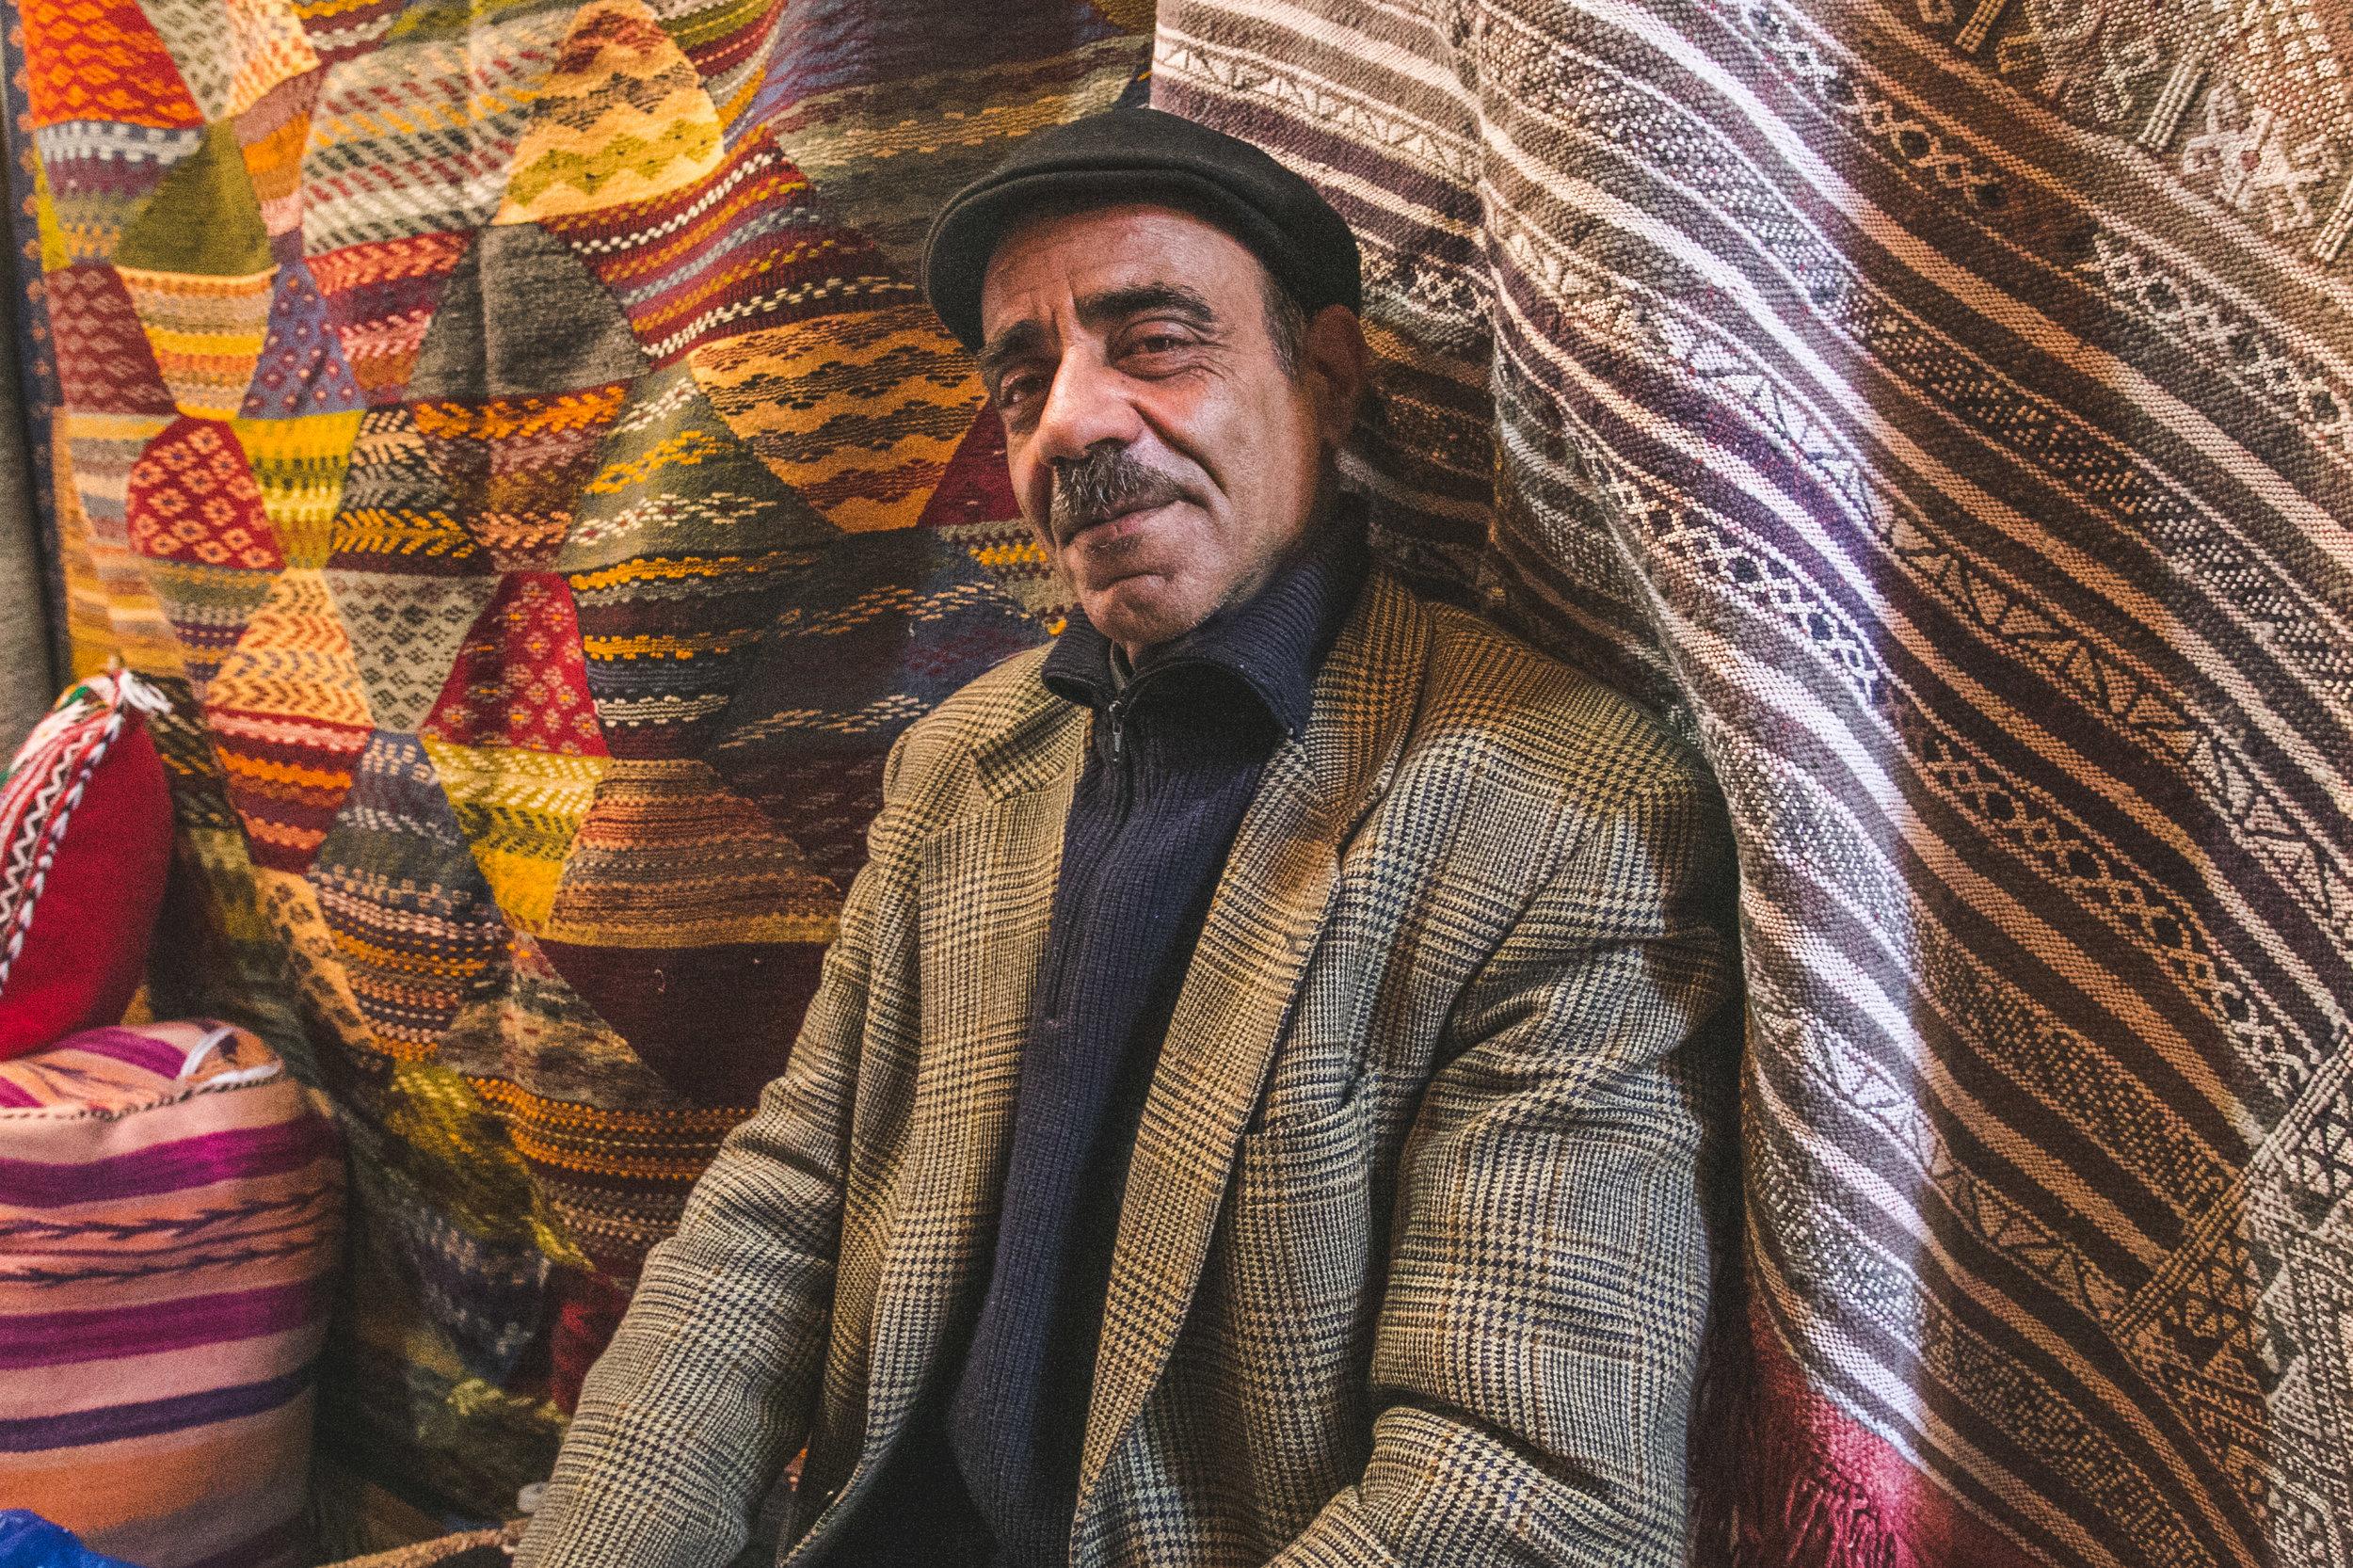 Abdoul Aziz - Carpet Salesman - Fes, Morocco